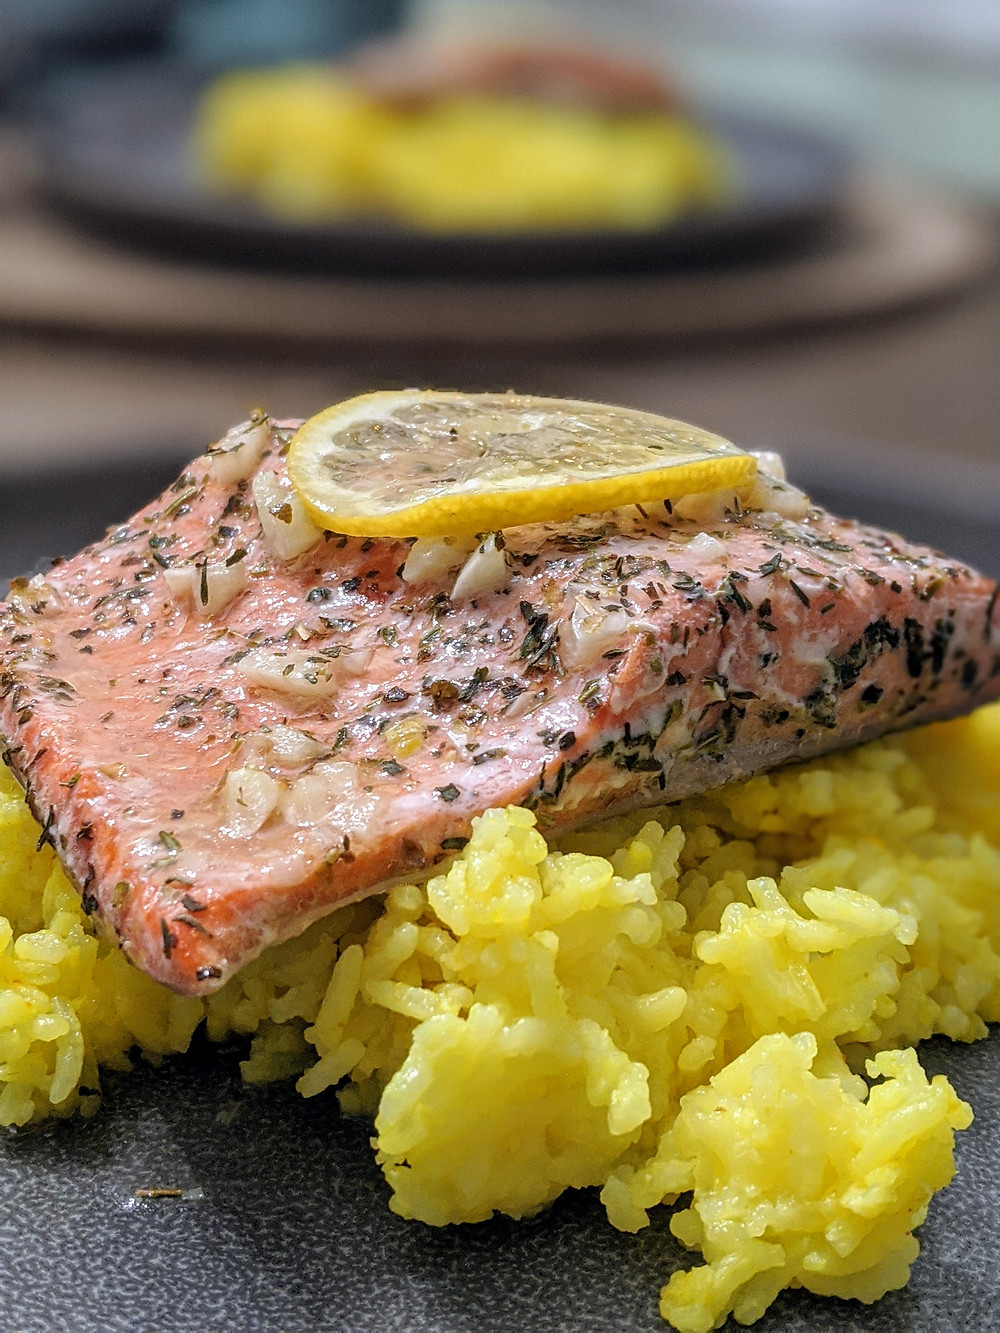 Salmon with Lemon Garlic Herb Seasoning - Amanda MacGregor - Food Allergy Recipes